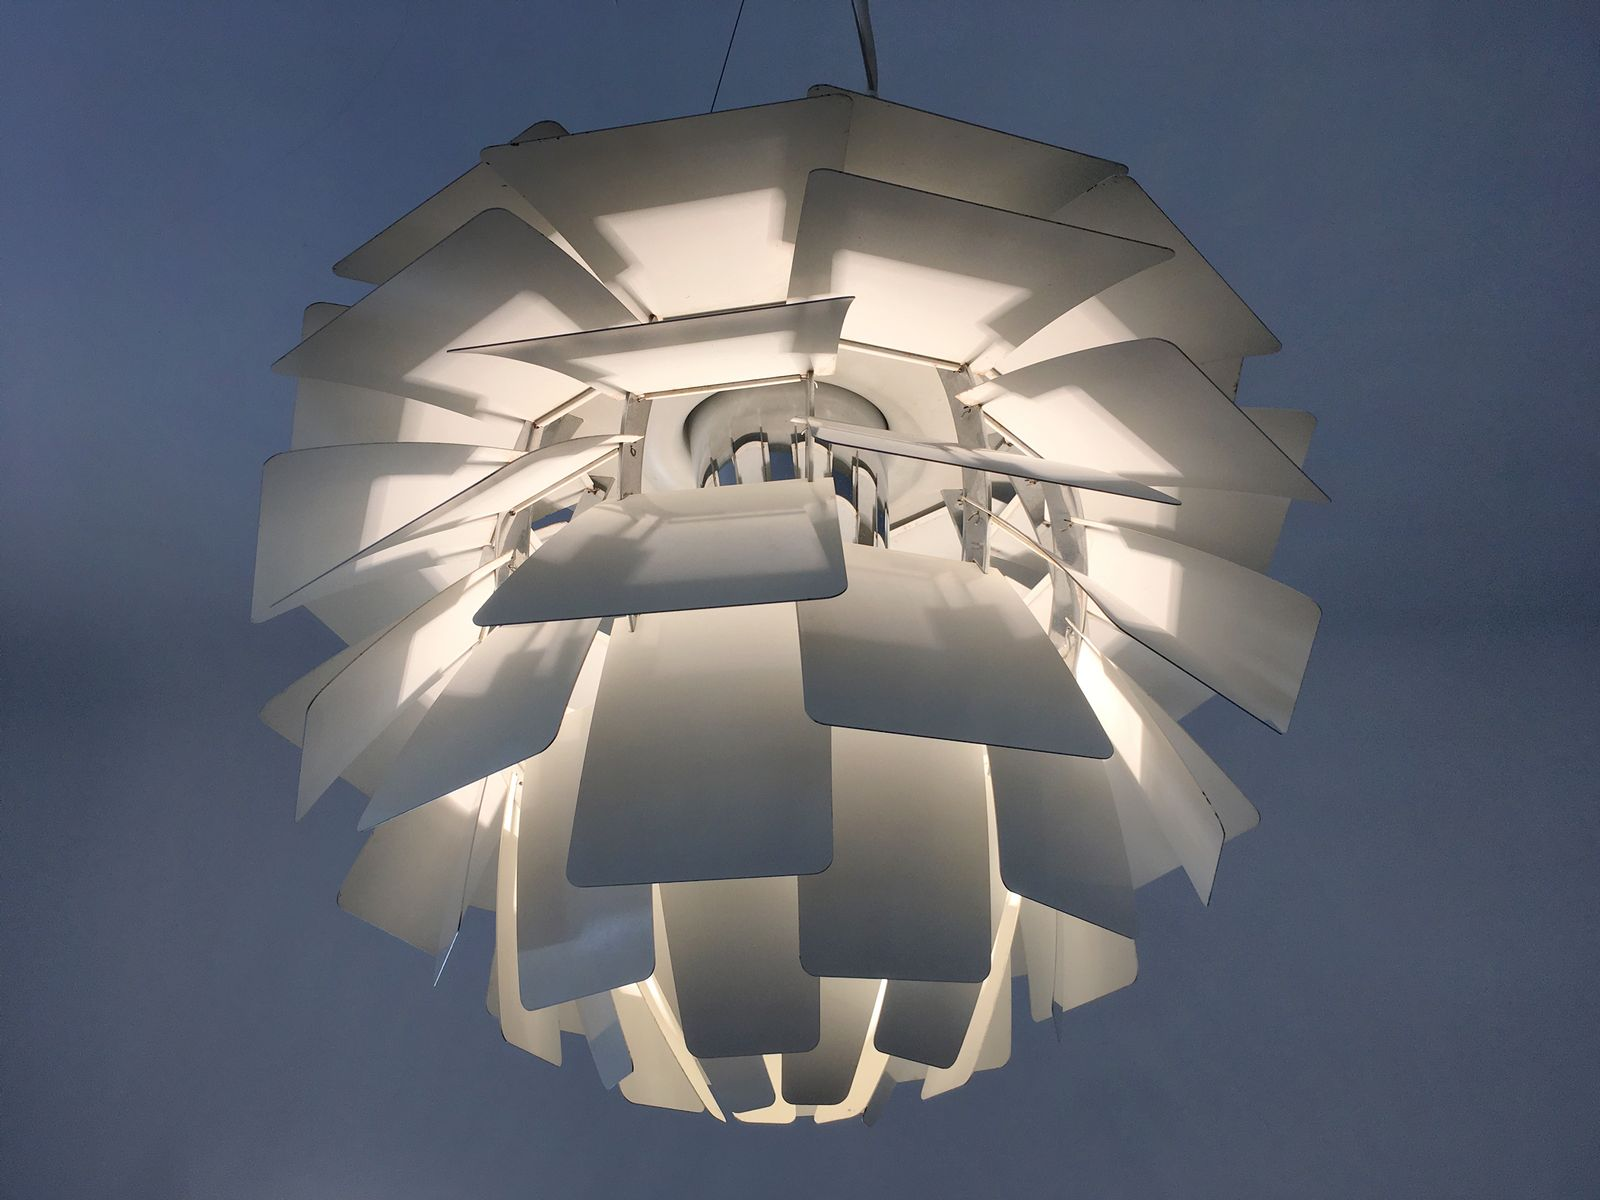 Vintage Artichoke Lamp by Poul Henningsen for Louis Poulsen for